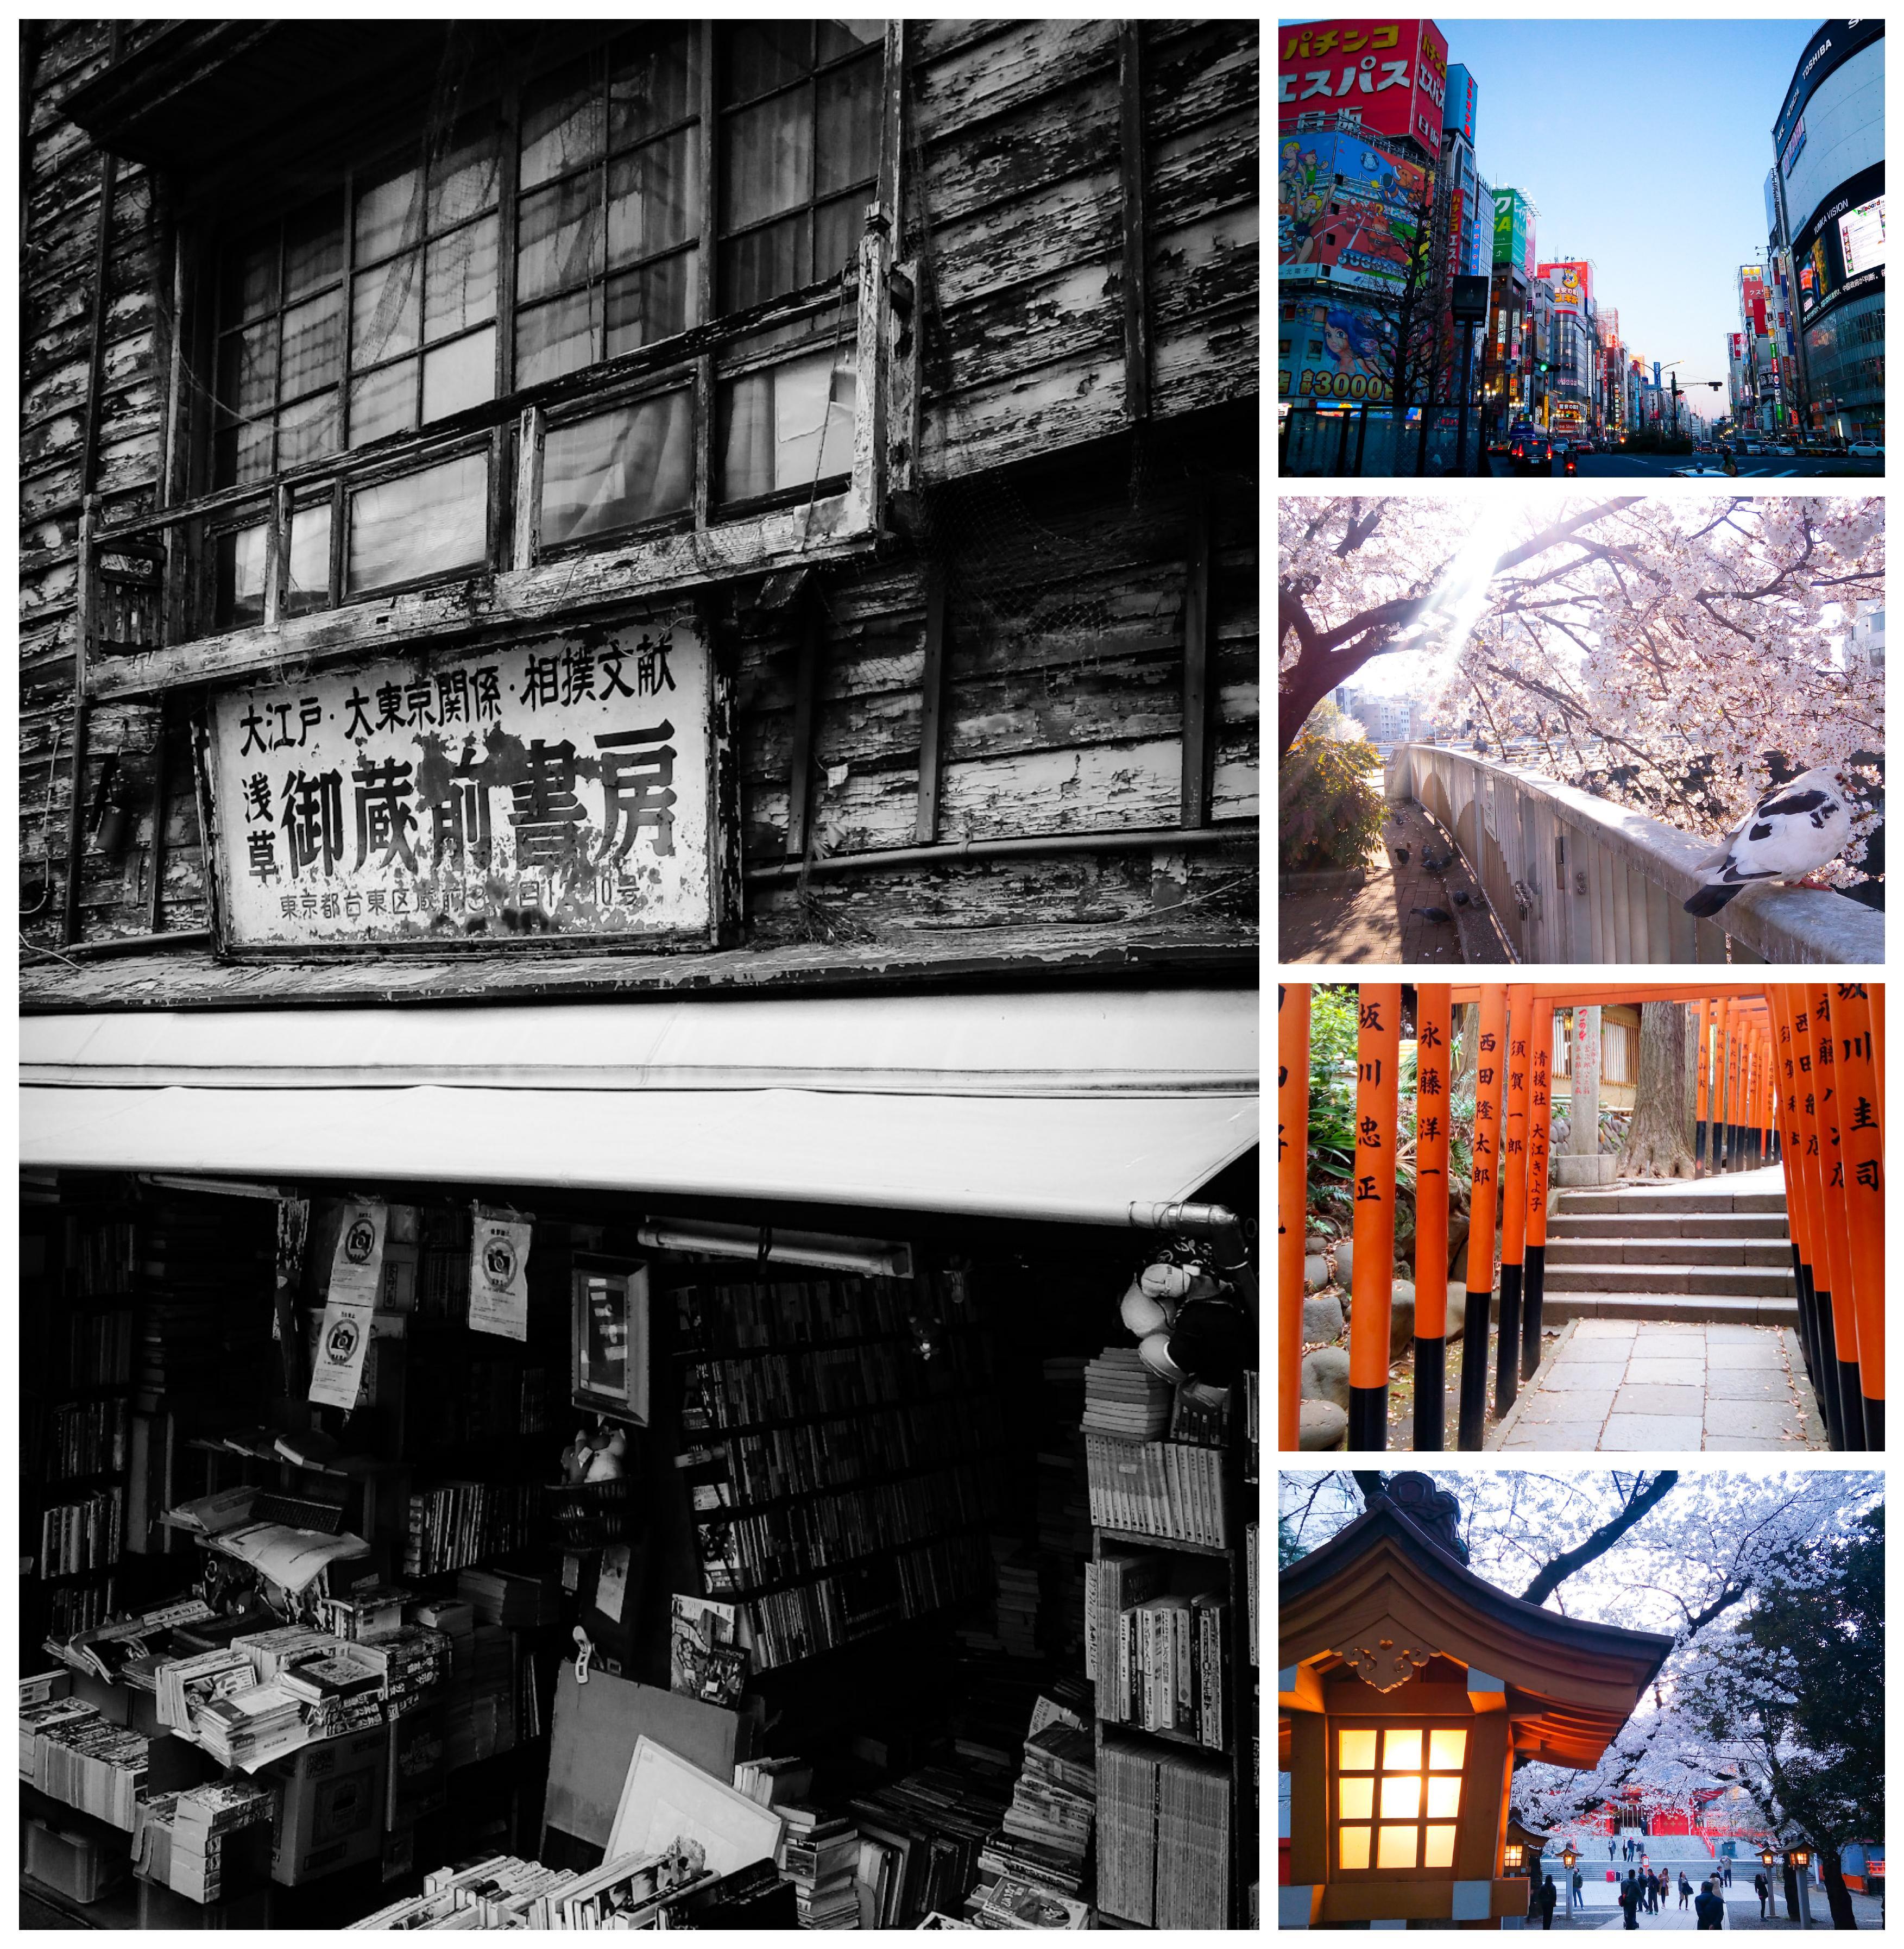 Urban photos - Shinkuku, Tokyo, Japan. 'Walk from Ikebukuro to Shinjuku.' Images taken on a walk from Ikebukuro to Shinjuku. Sometimes, just taking an unplanned stroll through a city, like Tokyo, can reveal unexpected and stunning sights. sketchbookexplorer.com @davidasutton @sketchbookexplorer Facebook.com/davidanthonysutton #japan #ikebukuro #zoshigayakishimoijitemple #shinjuku #travel #travelblog #photography #cheeryblossom #cherryblossomseason